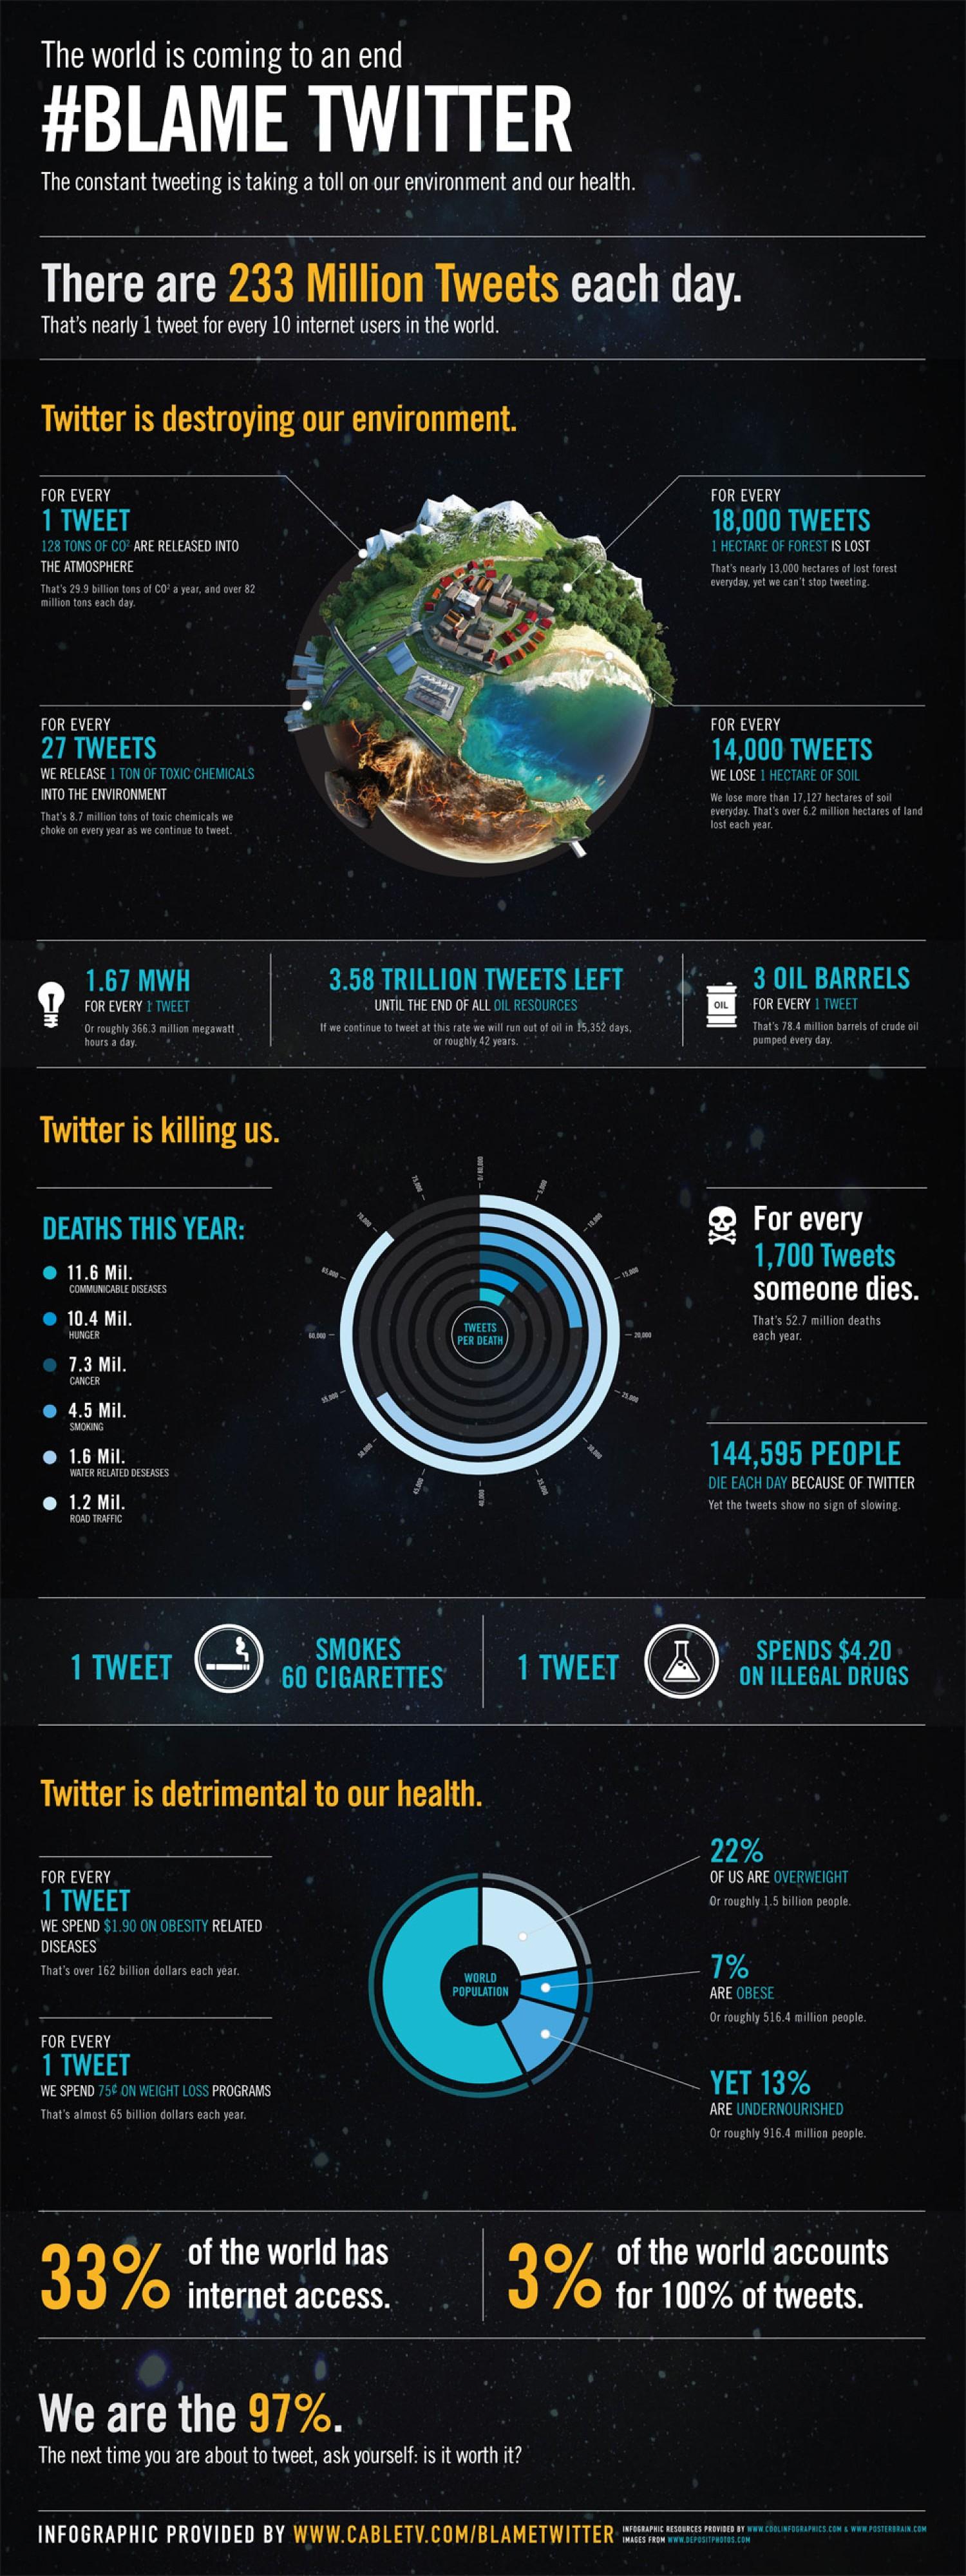 5. Blame Twitter